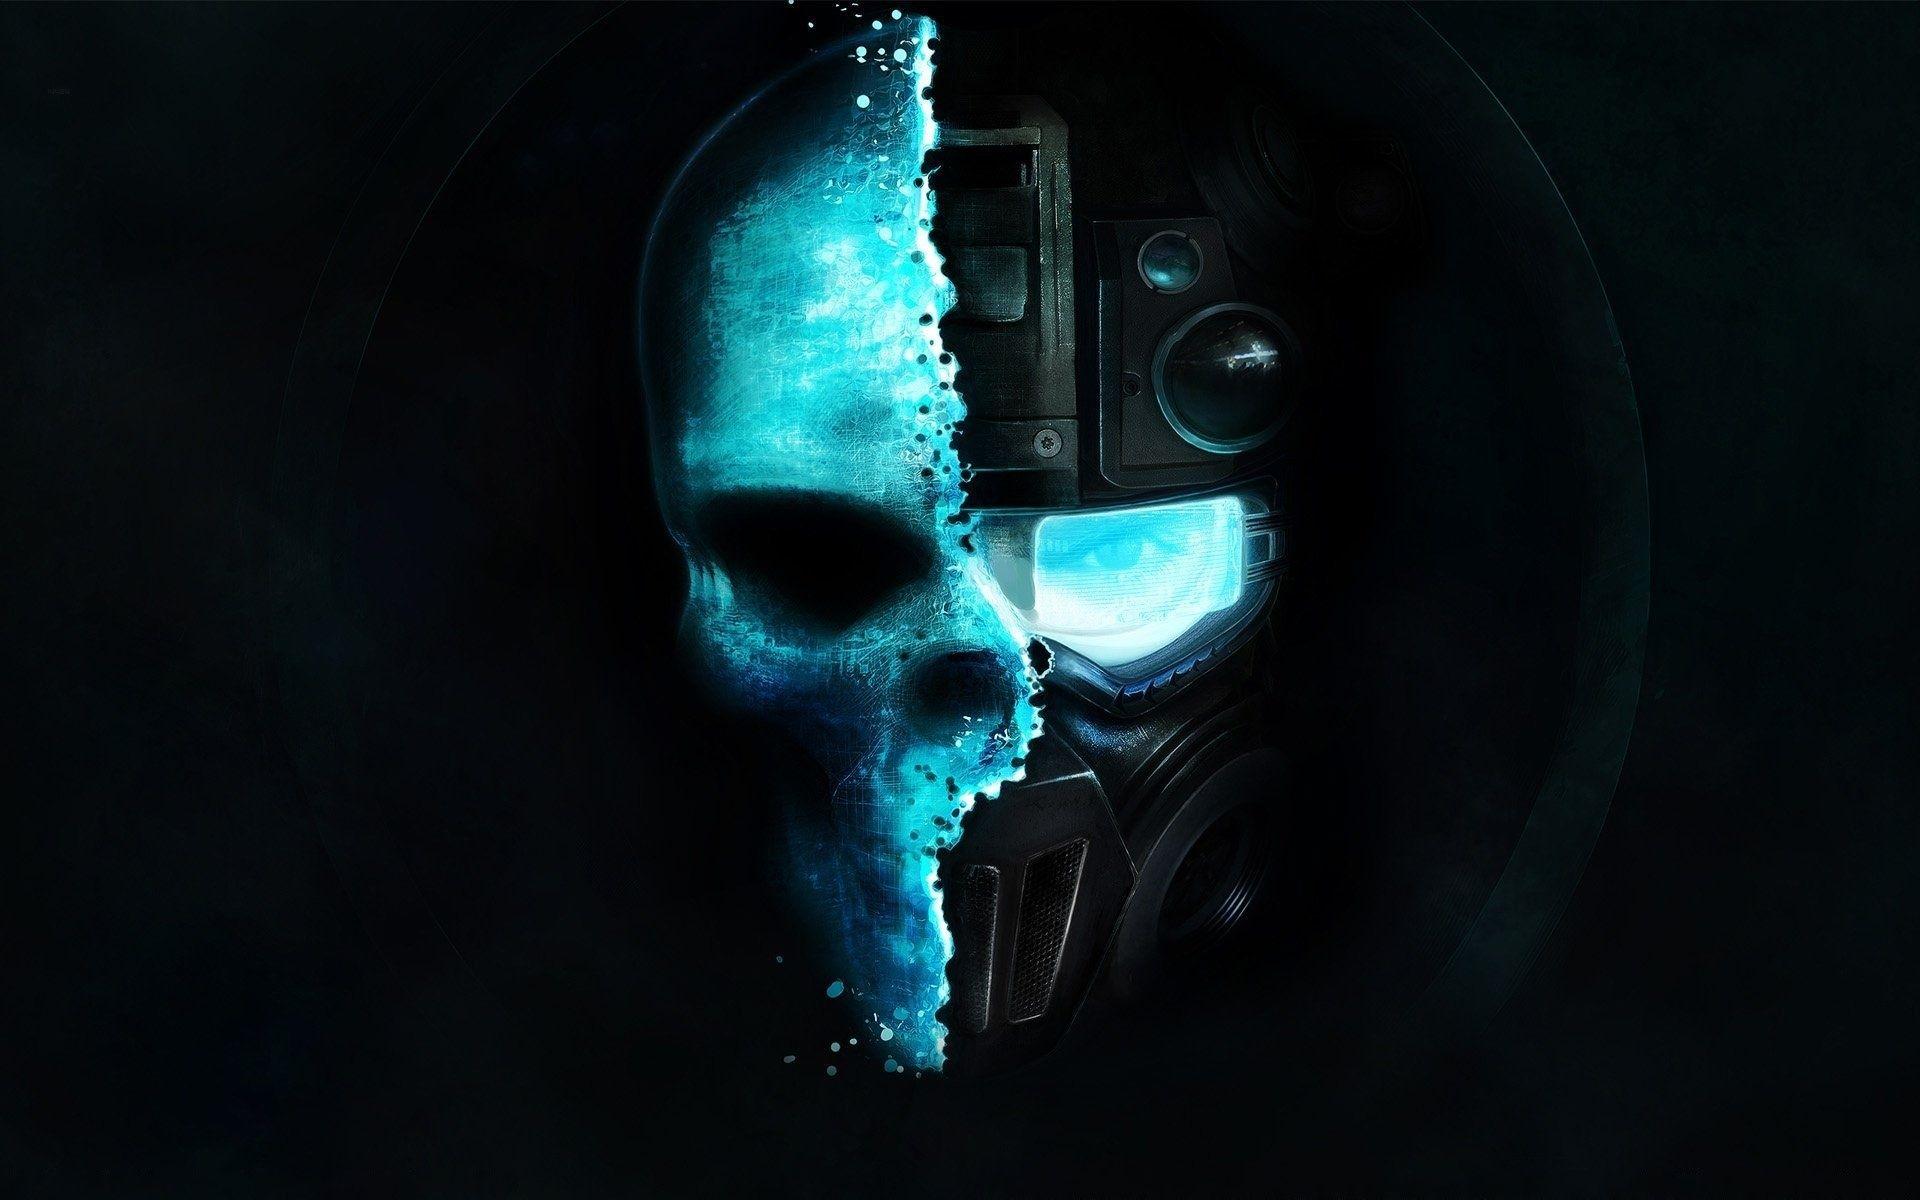 Ghost Recon Future Soldier Dark Horror Skulls Face Sci Fi Science Futuristic Wallpaper Background Skull Wallpaper Gaming Wallpapers Tom Clancy Ghost Recon